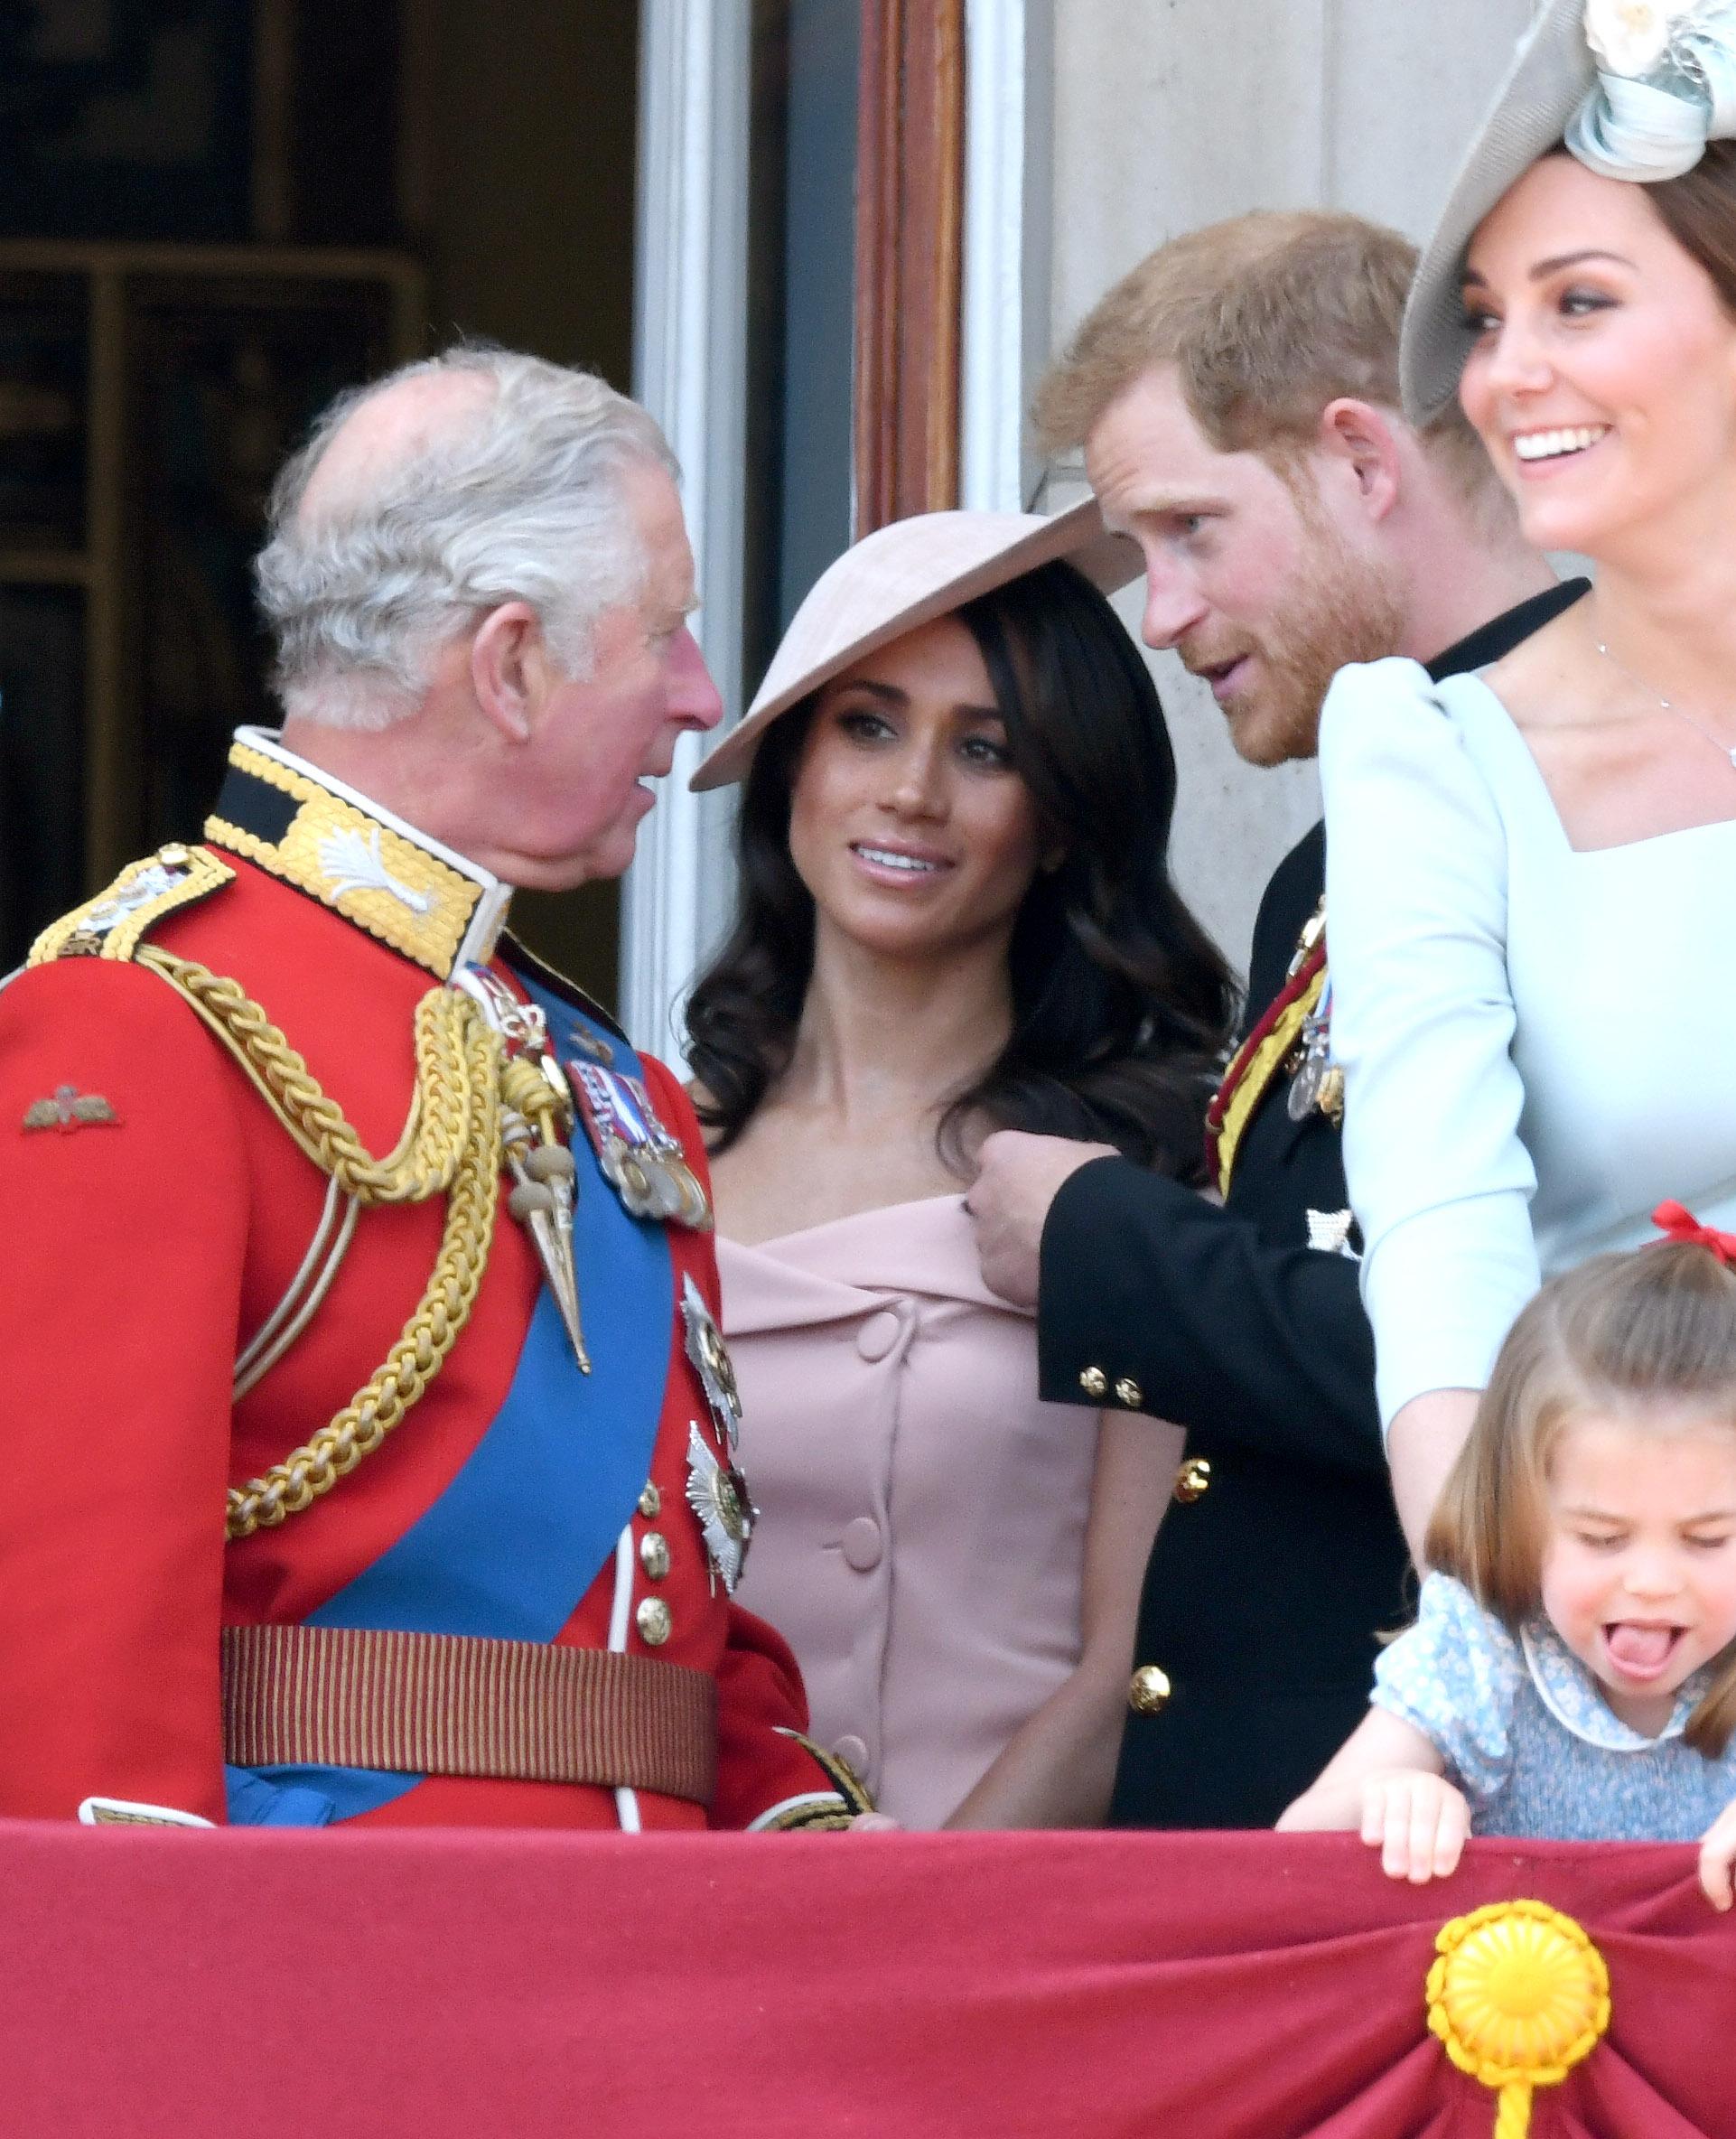 Meghan Markle, Príncipe Harry, Príncipe Carlos